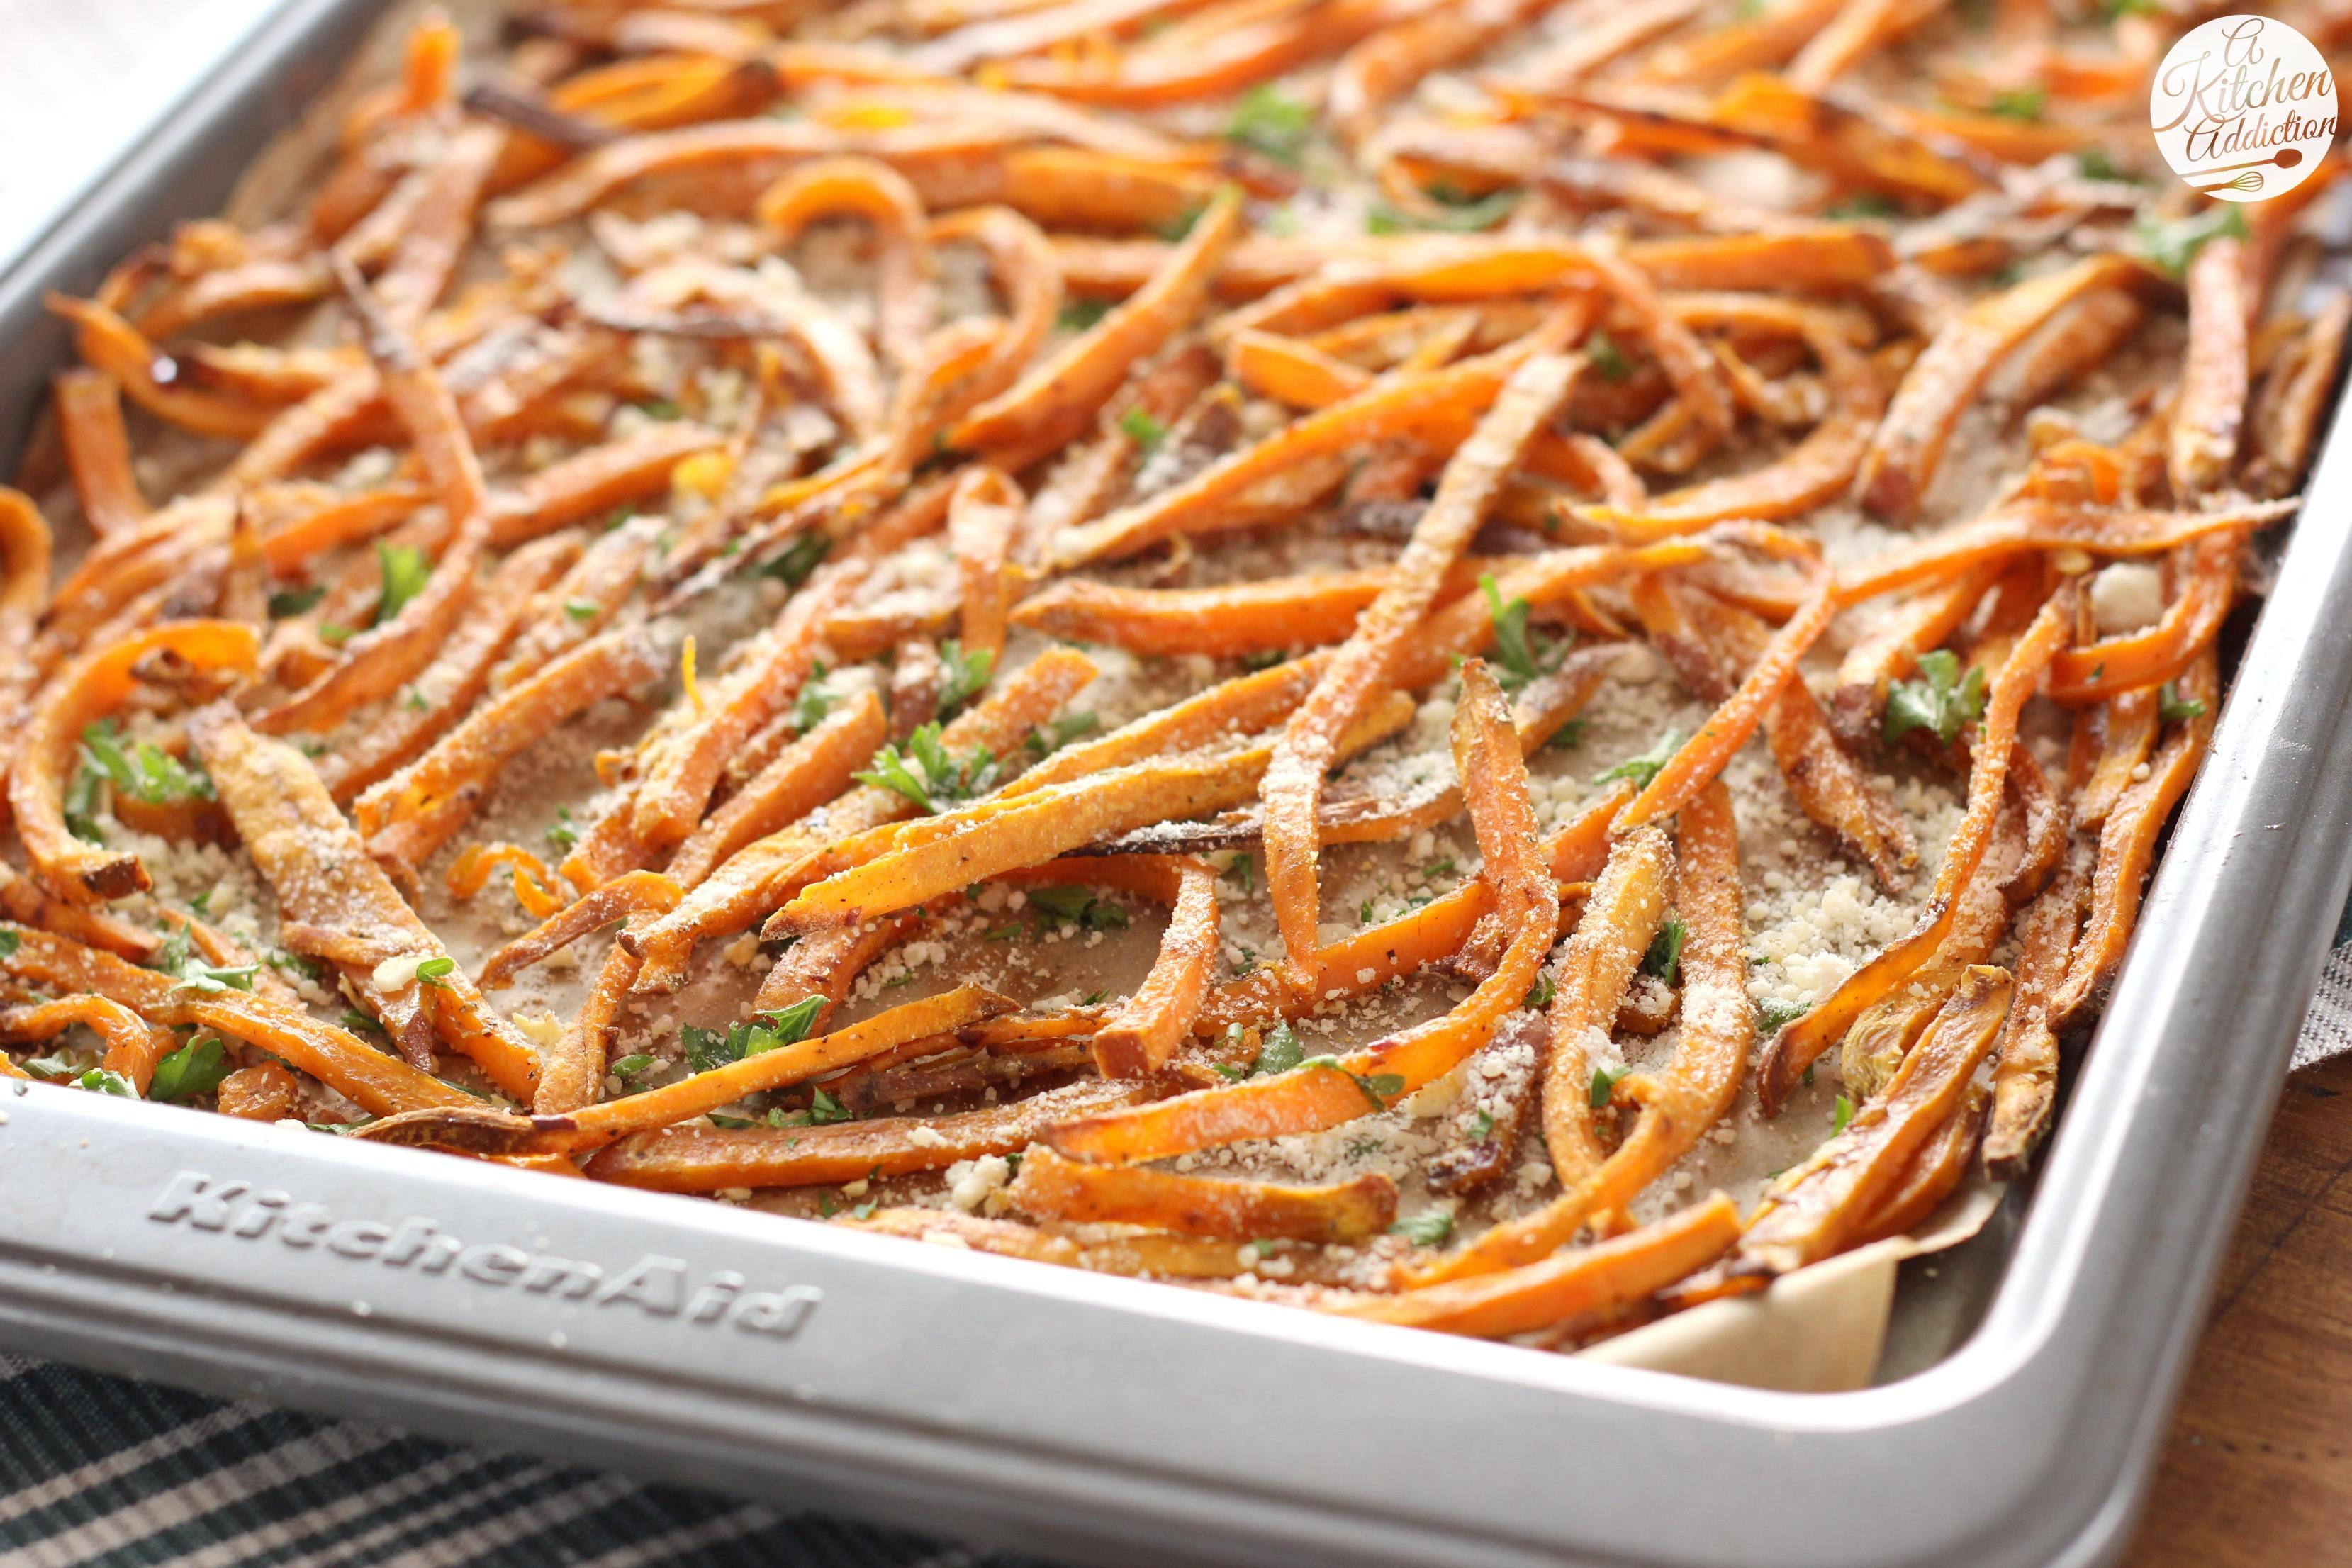 Sweet Potato Fry Recipe  Garlic and Herb Sweet Potato Fries A Kitchen Addiction